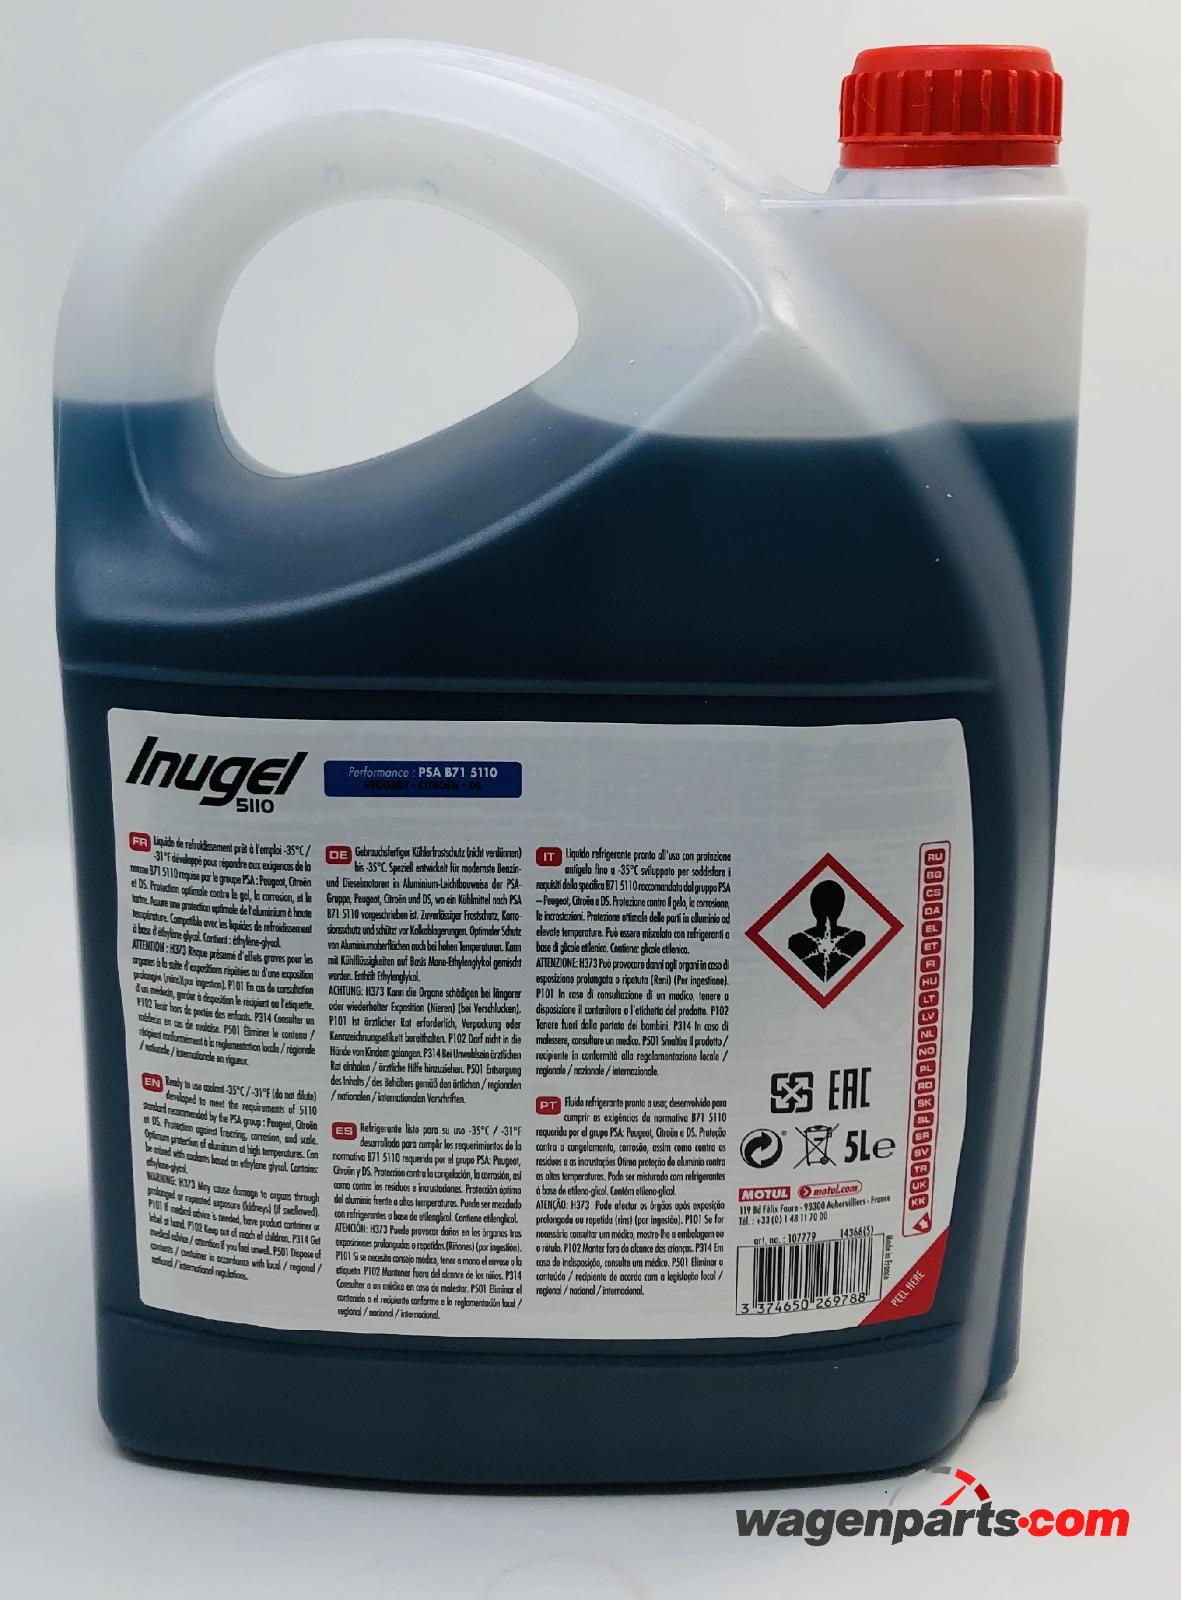 s l1600 - Anticongelante Refrigerante Peugeot Citröen MOTUL Inugel 5110 -35°C, Pack 20 Lts